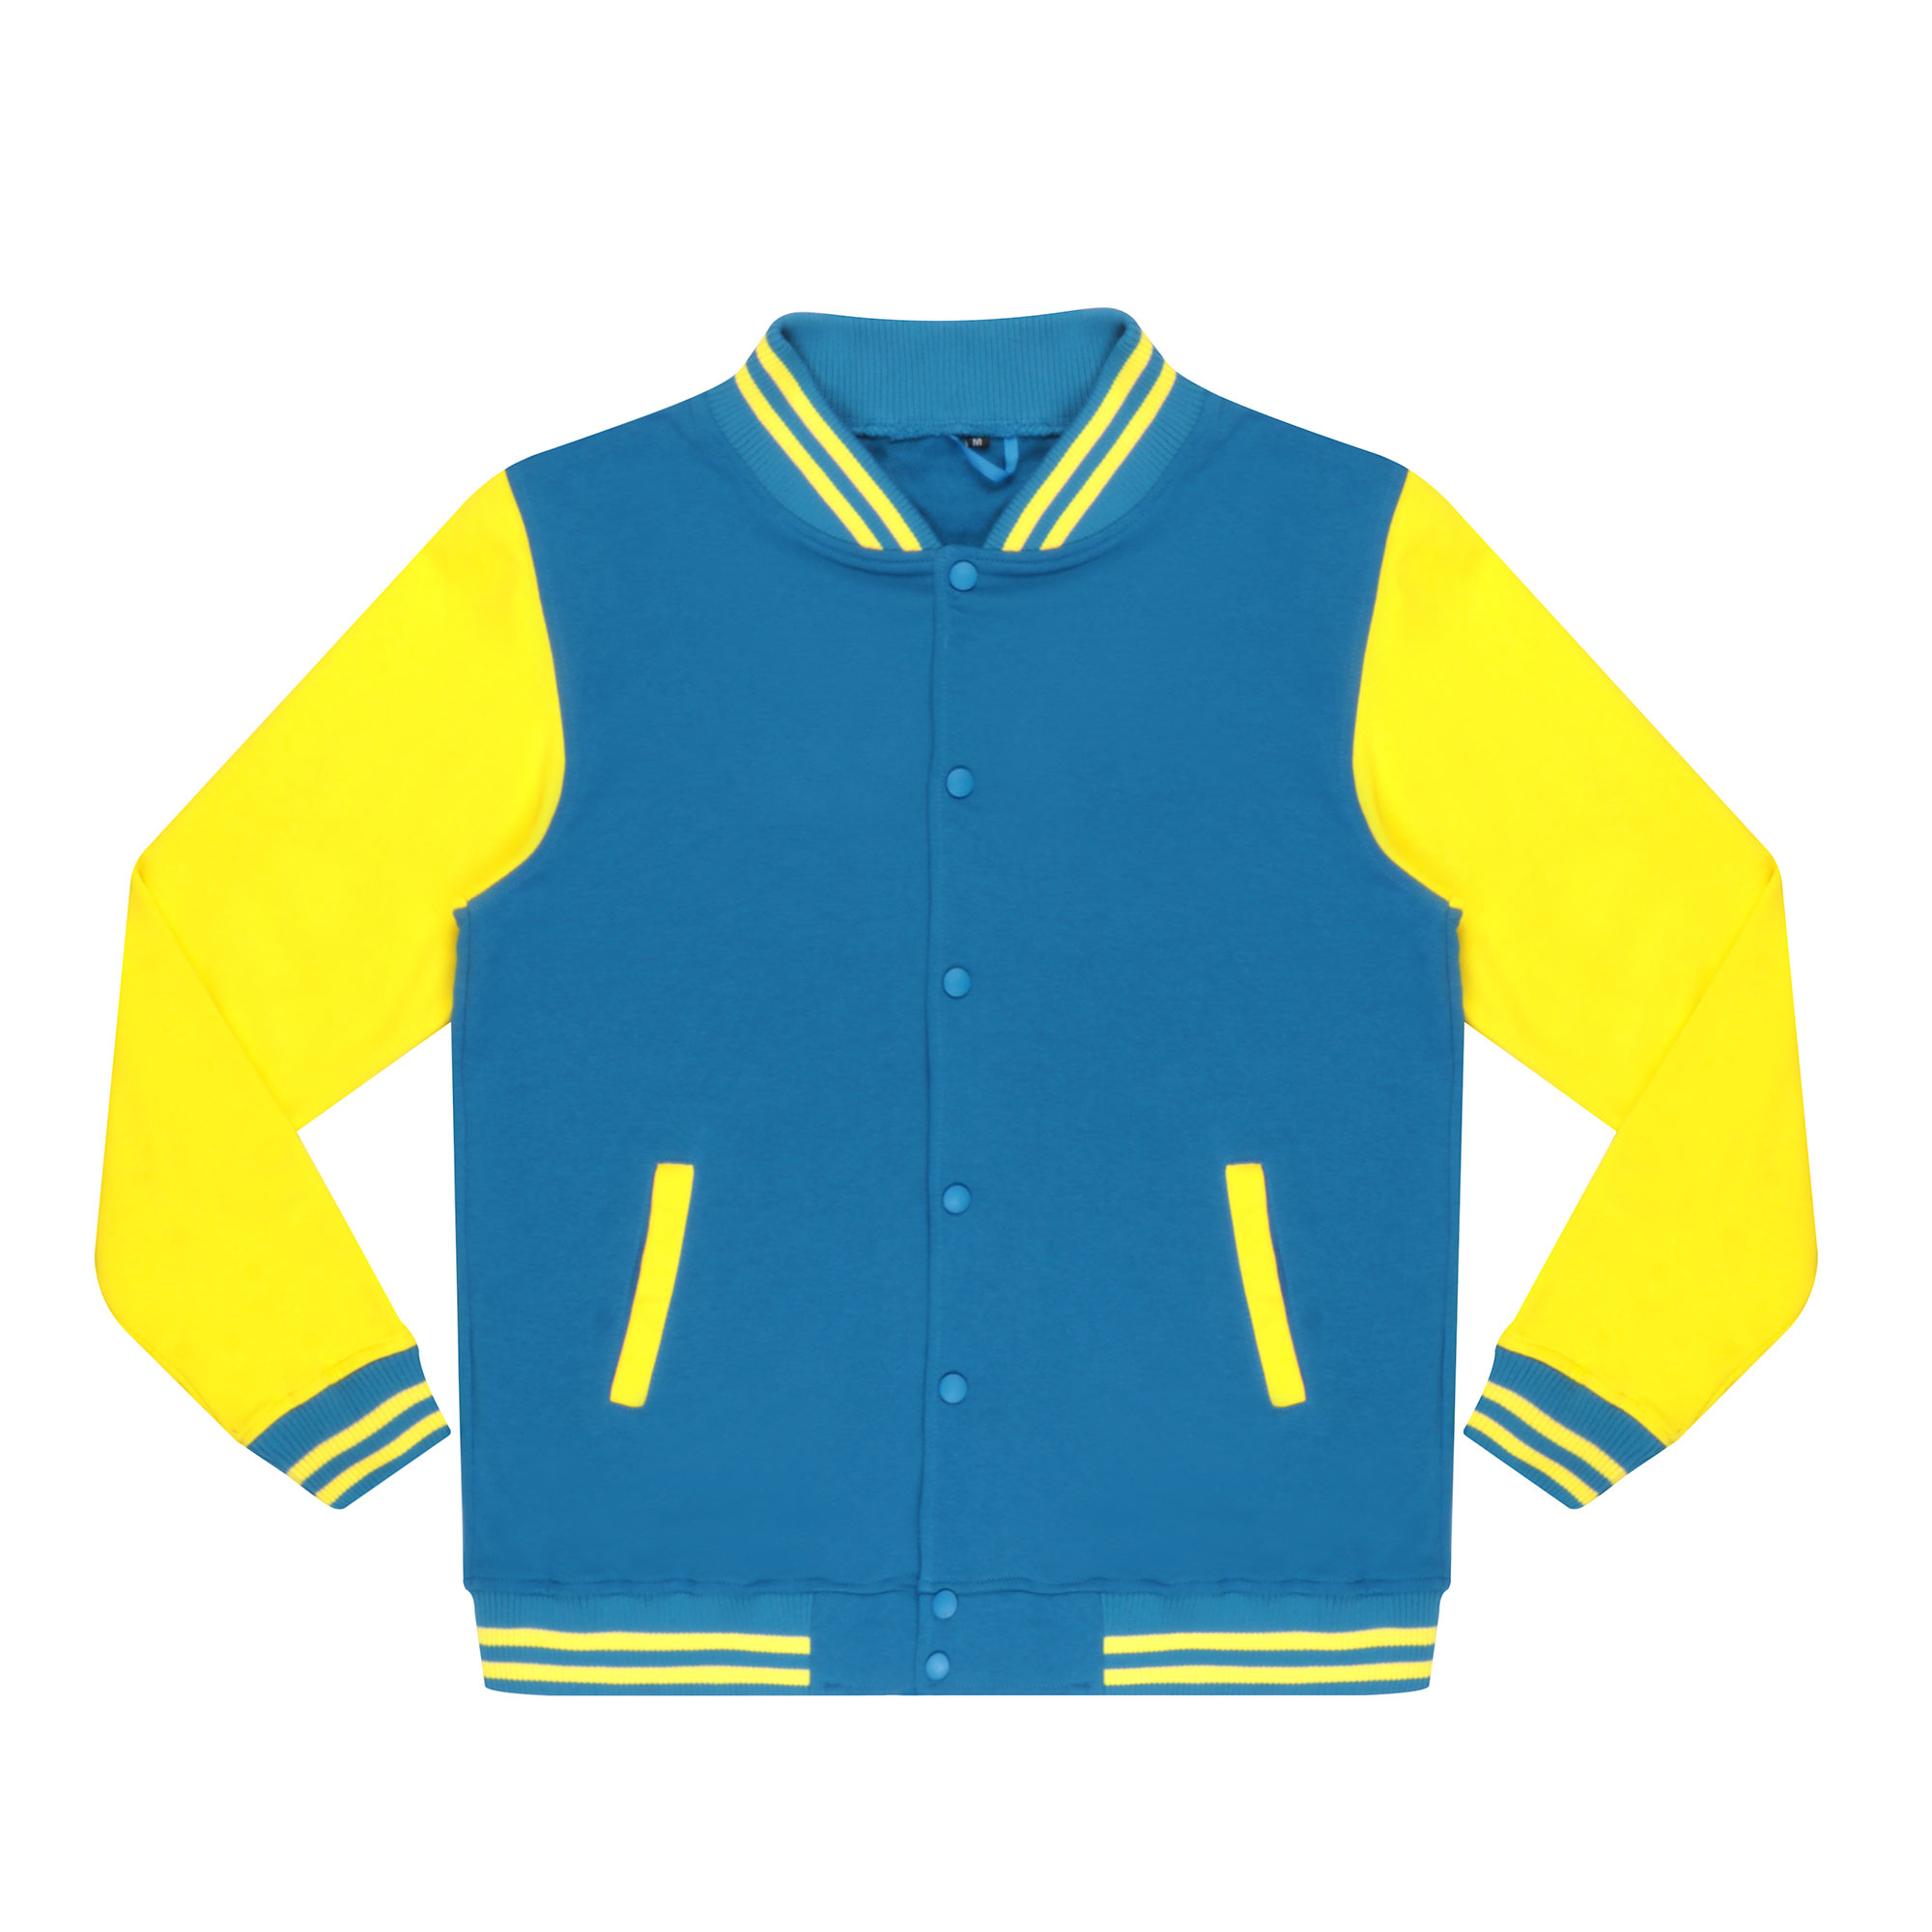 Бомбер Garment тёмно-синий/жёлтый S хлопок